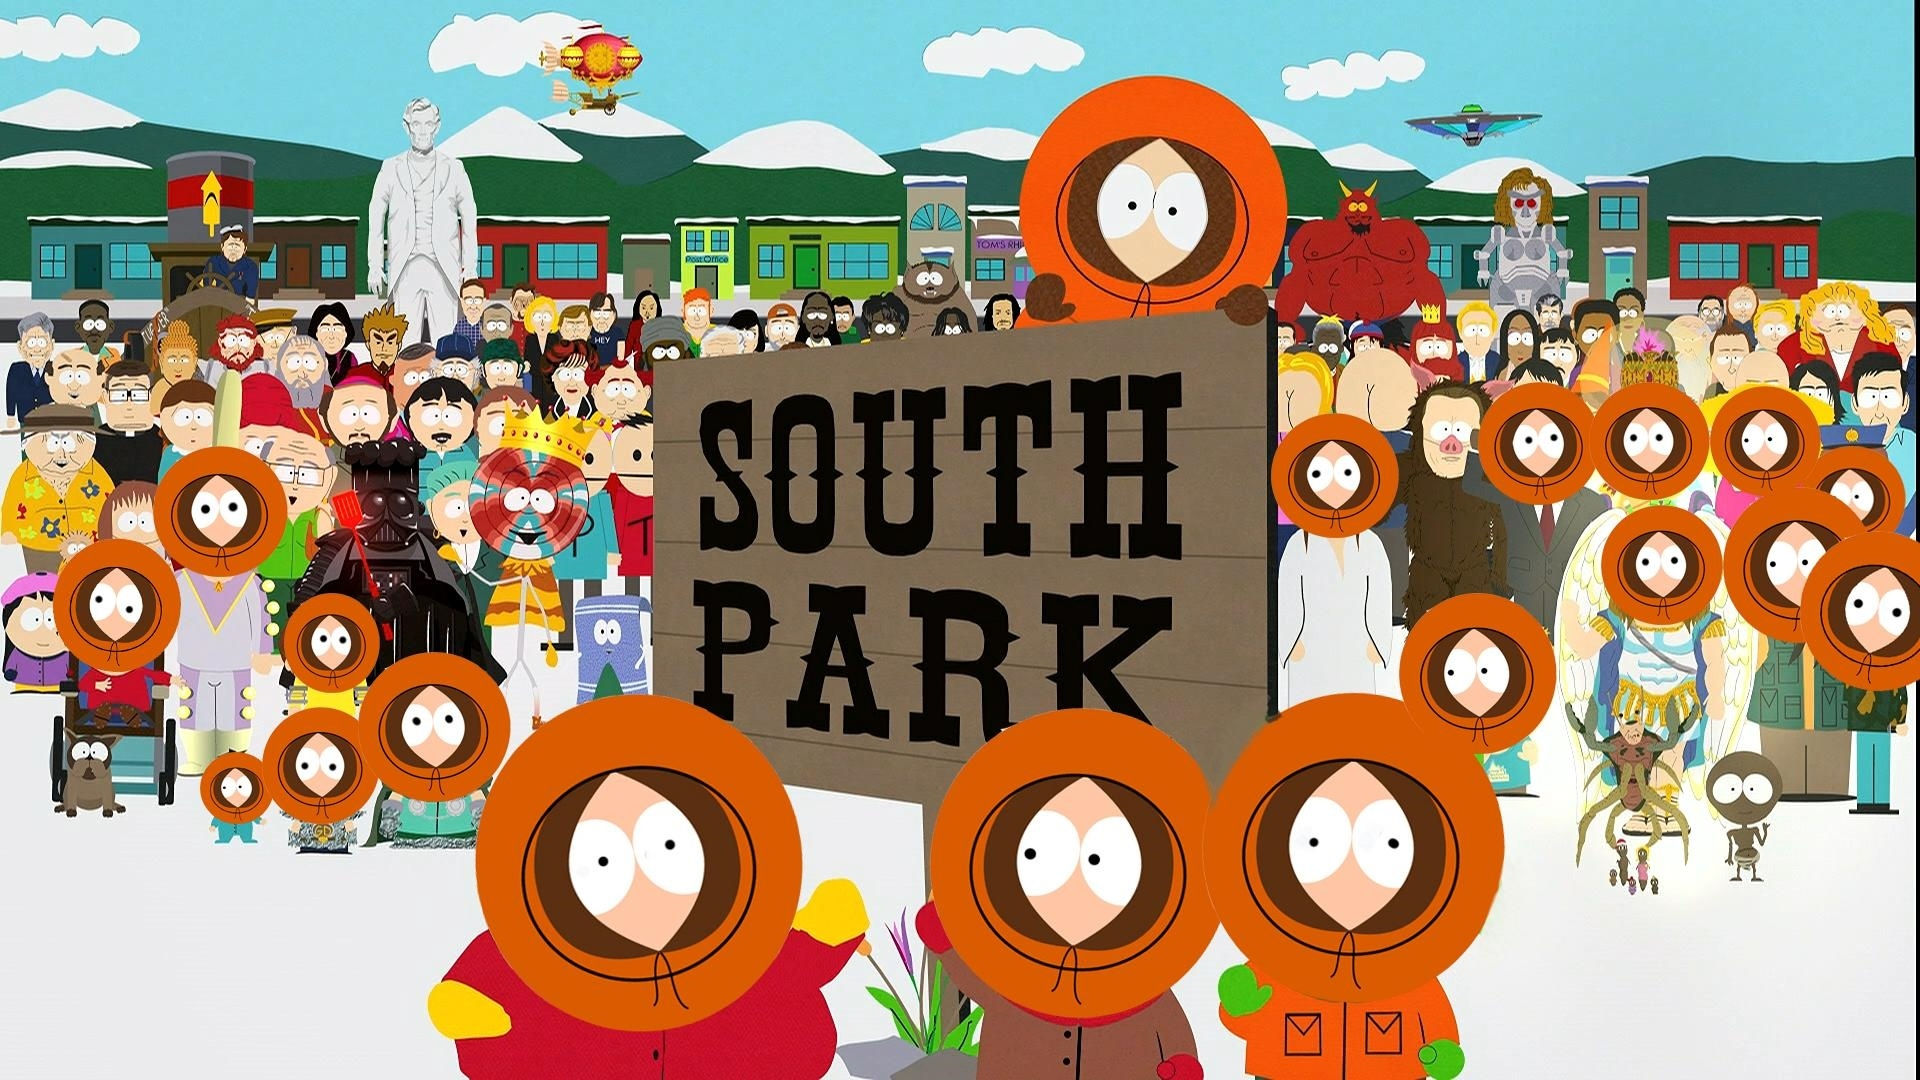 South Park best wallpaper